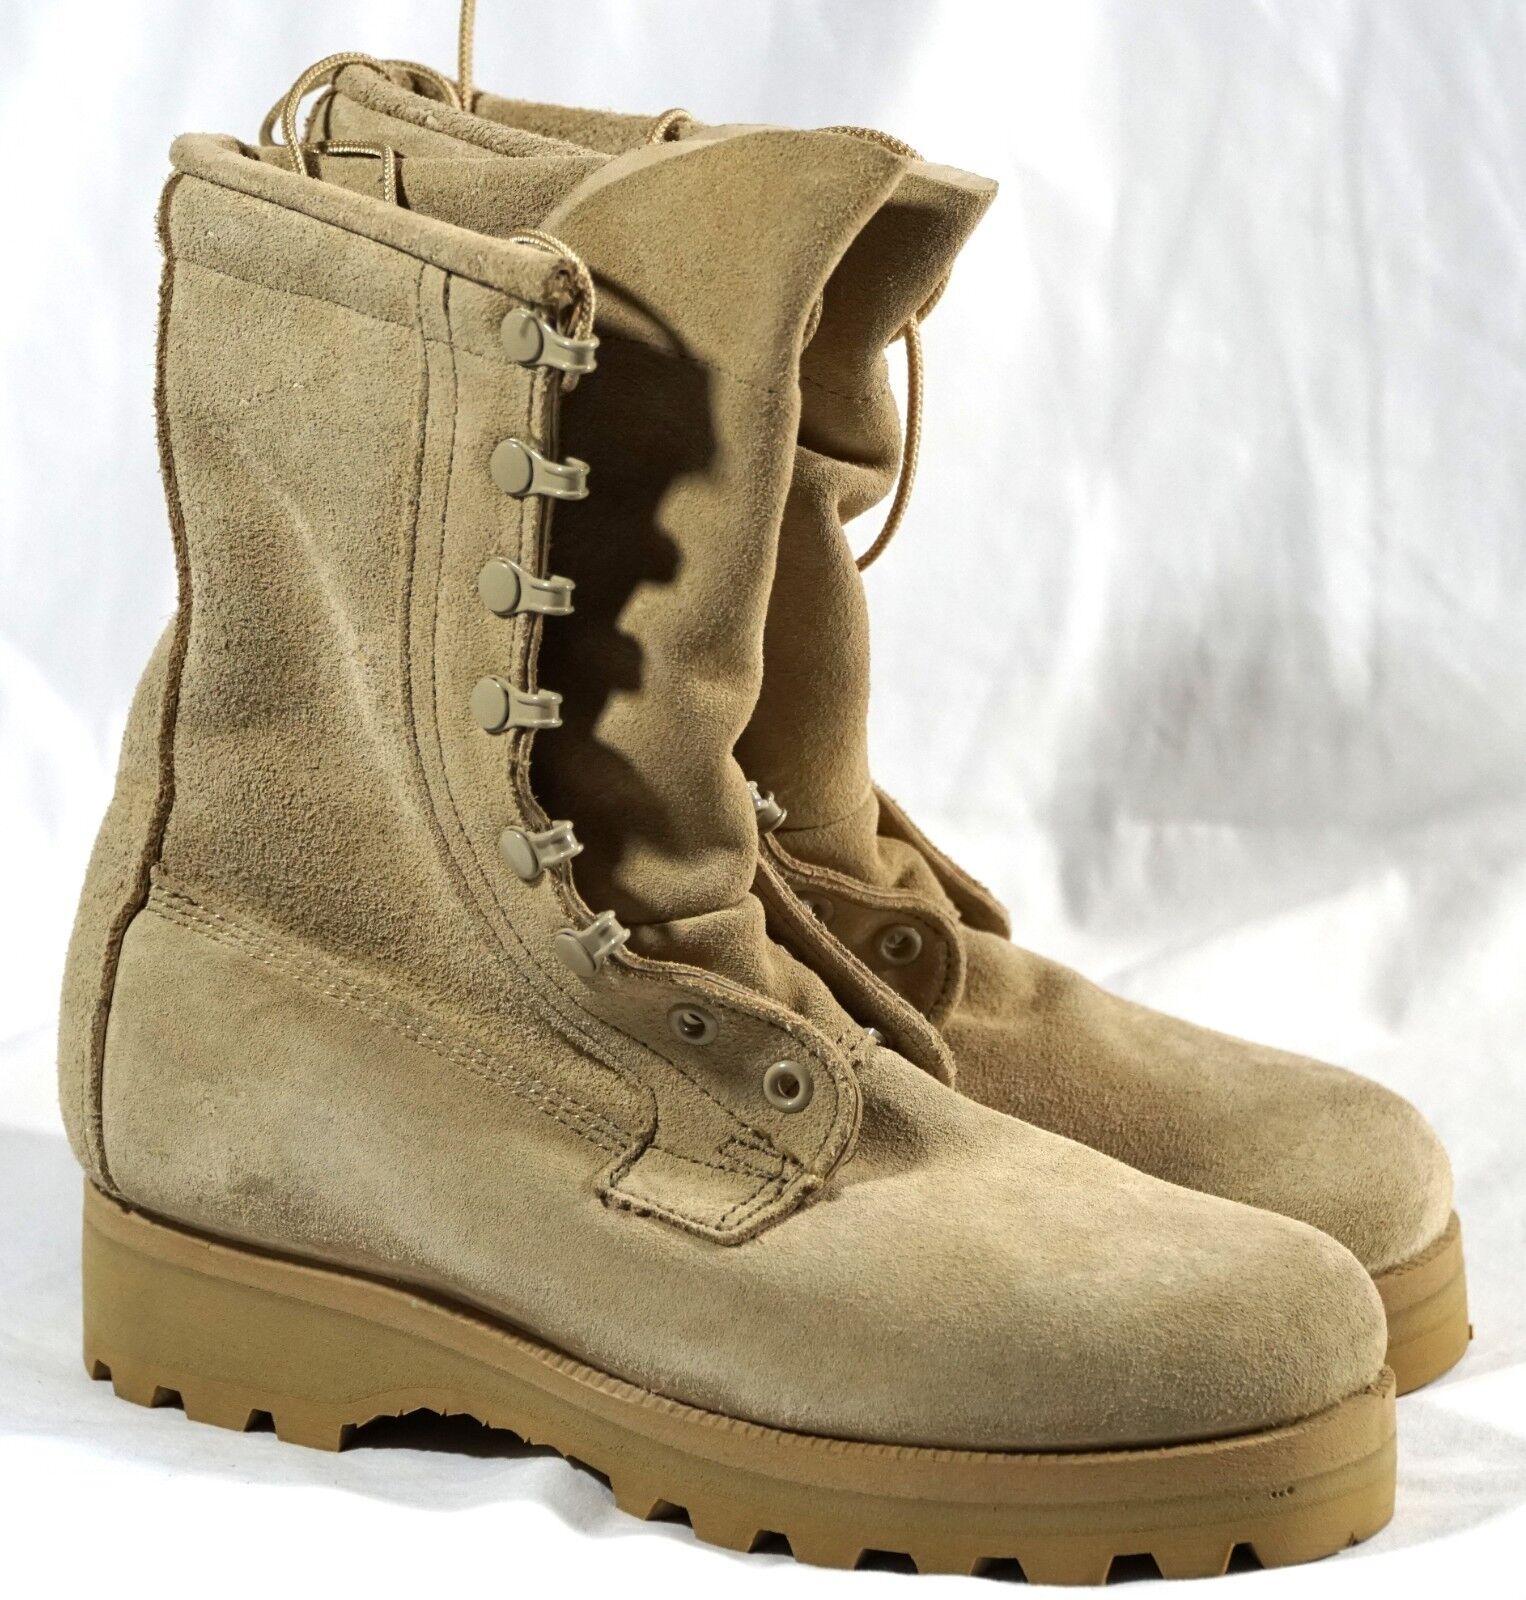 New wellco tan esercito contro goretex vibram militari stivali militari vibram usa Uomo dimensioni noi 5,5 r 2bc640